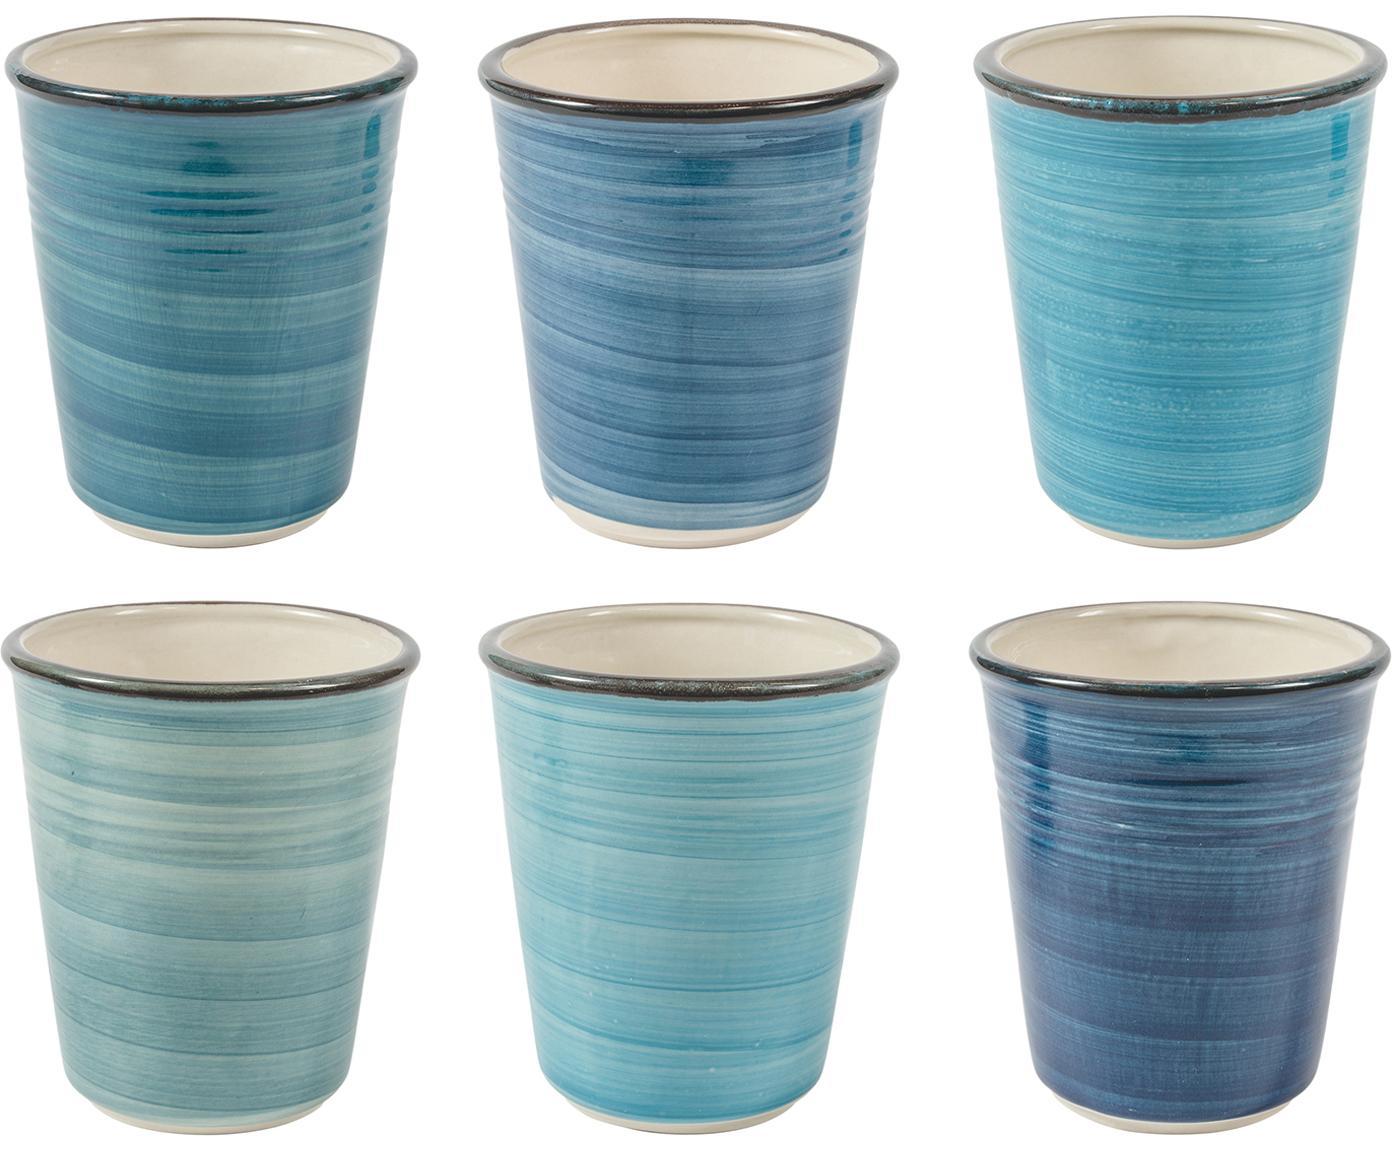 Tazas Baita, 6uds., Gres, Tonos azules, gris, beige, Ø 9 x Al 11 cm